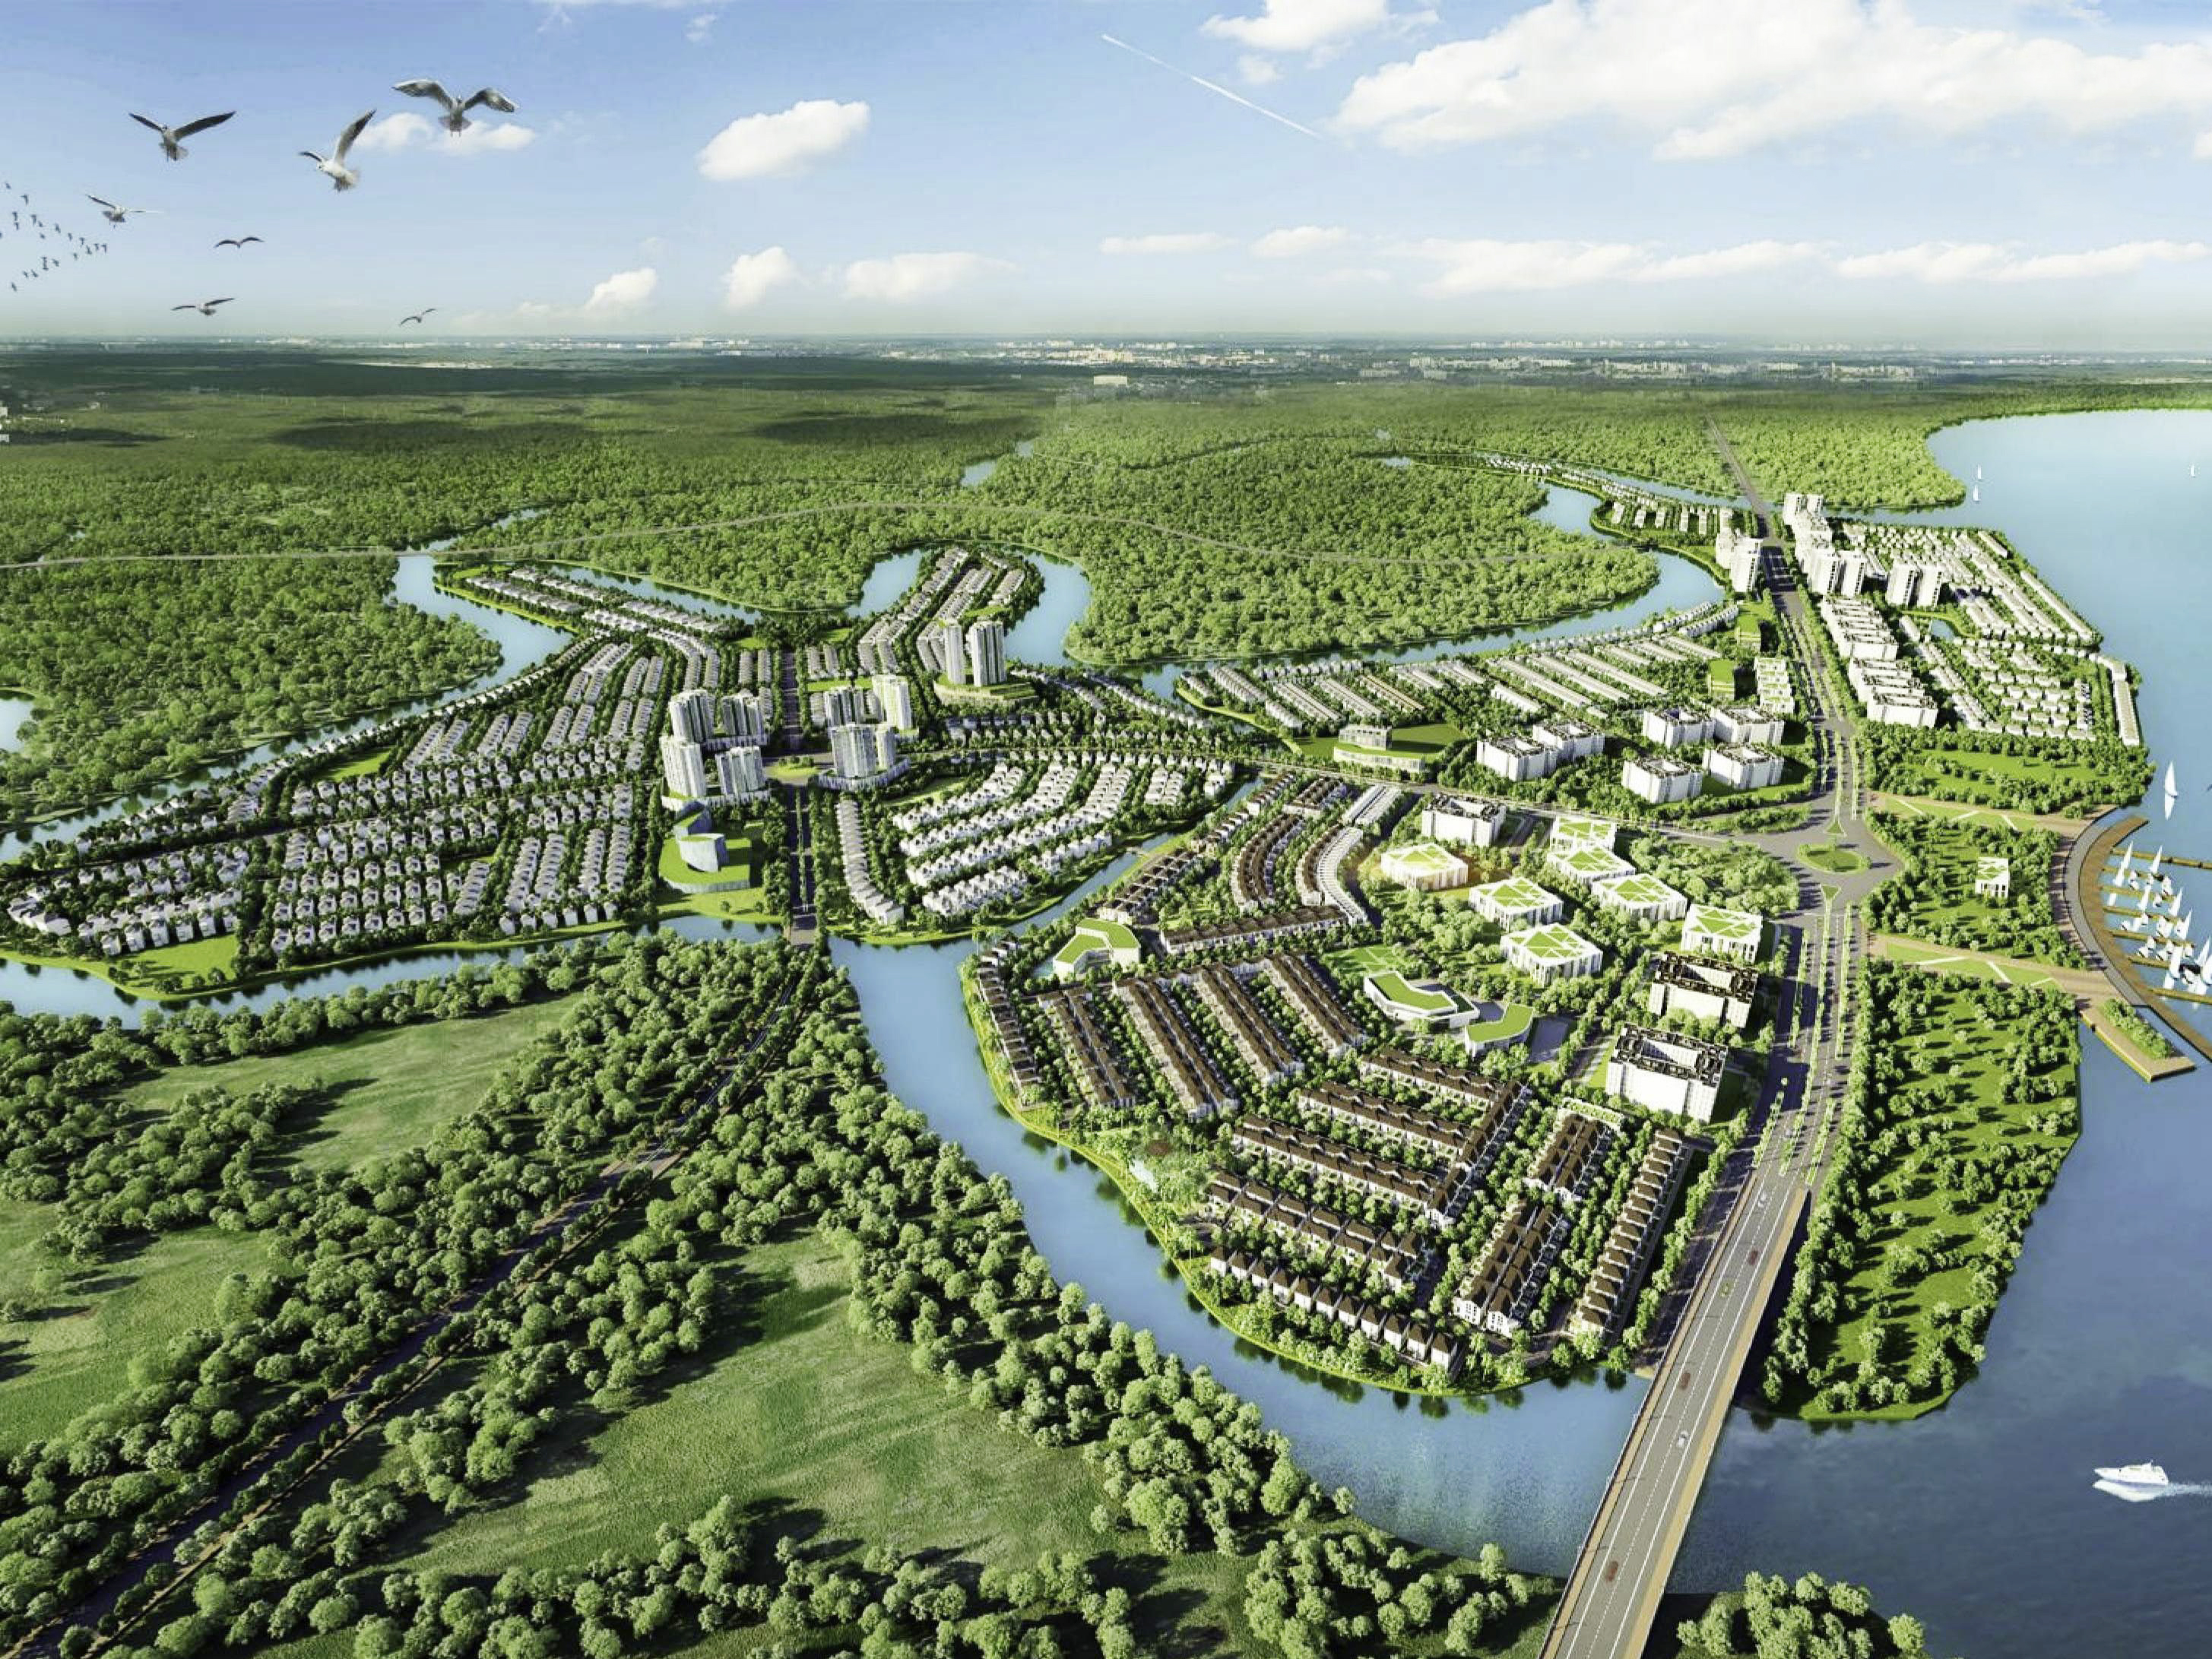 nhà mẫu aqua city quy hoạch